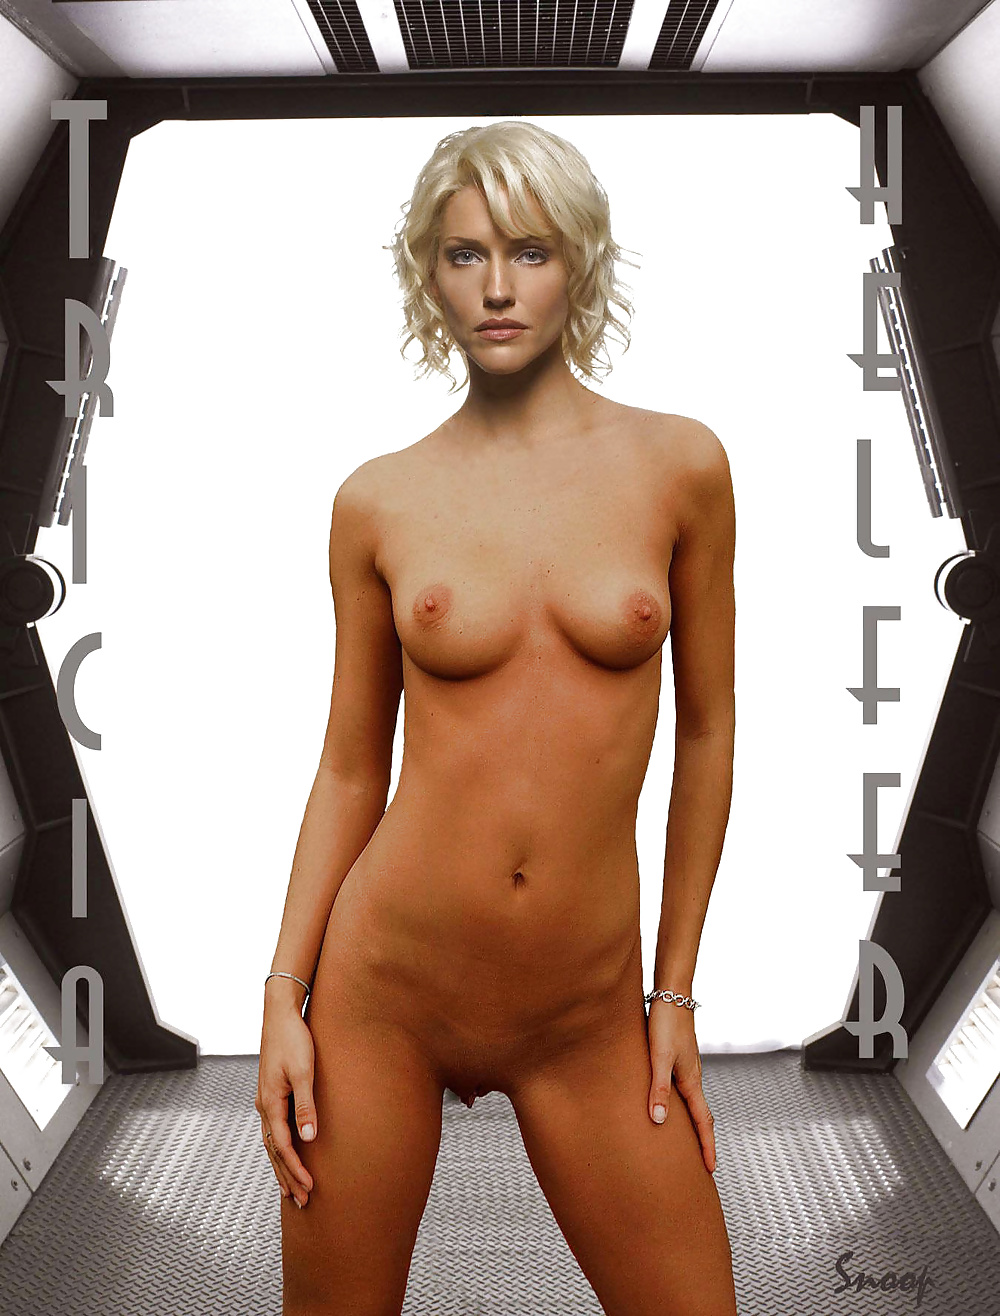 Battlestar galactica girls naked, big black girls